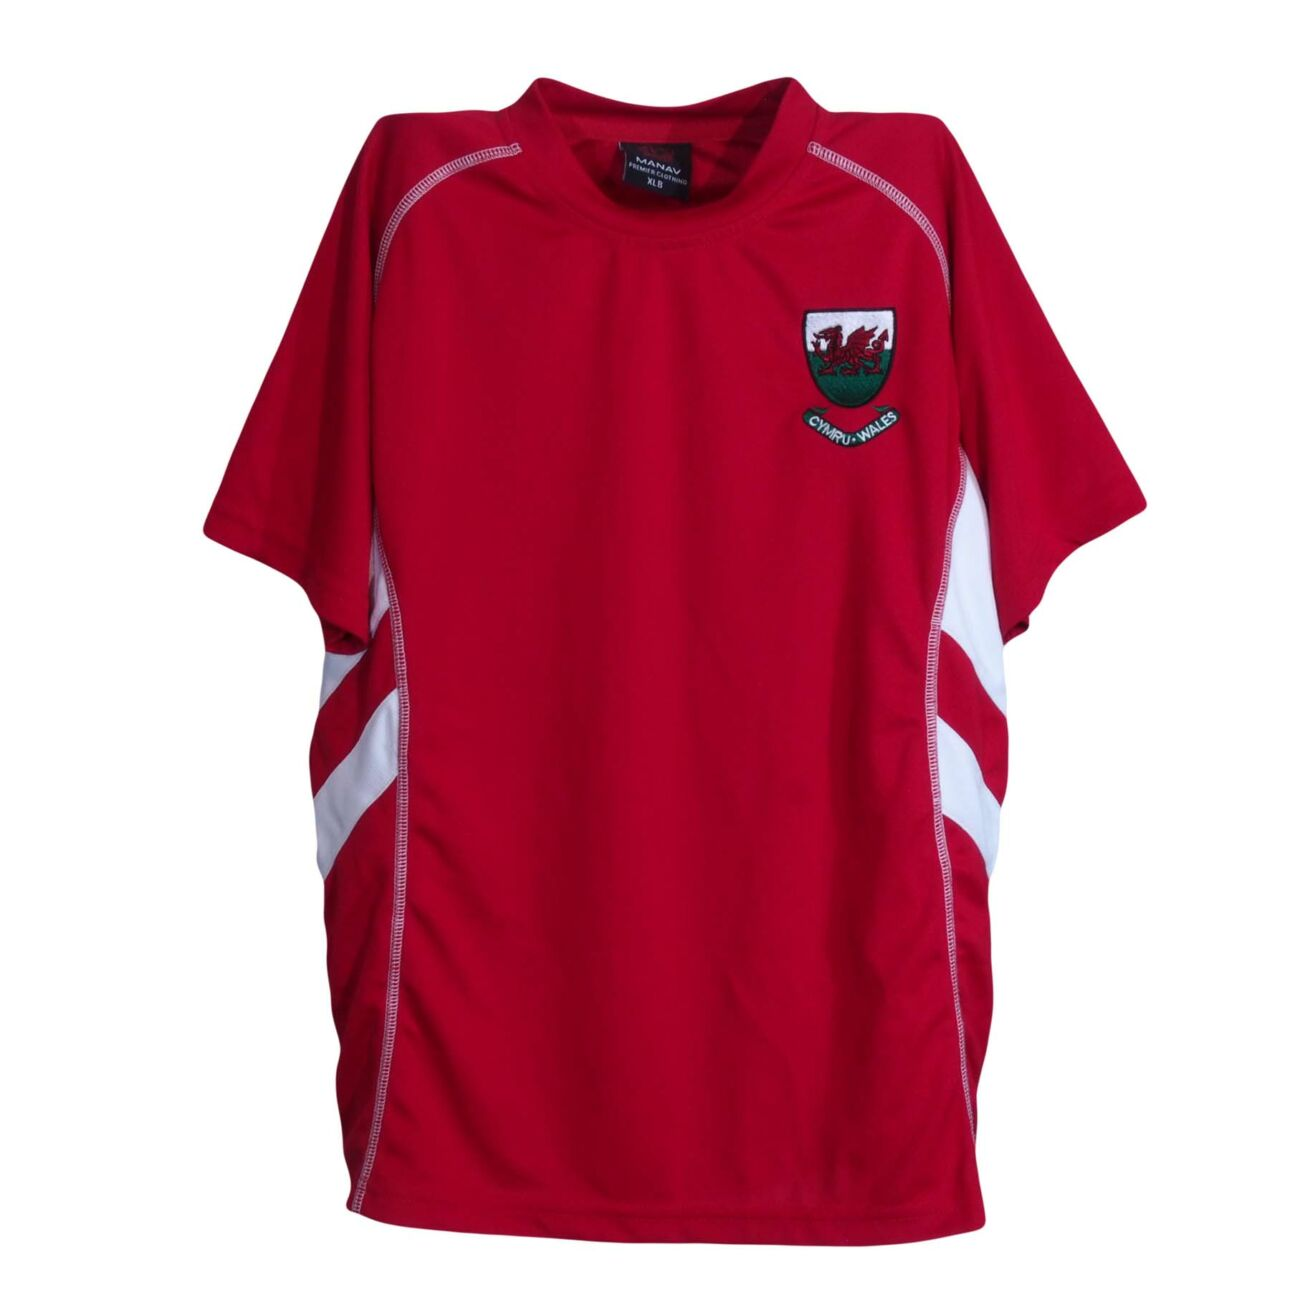 Piros sportfelső (13-14 év)